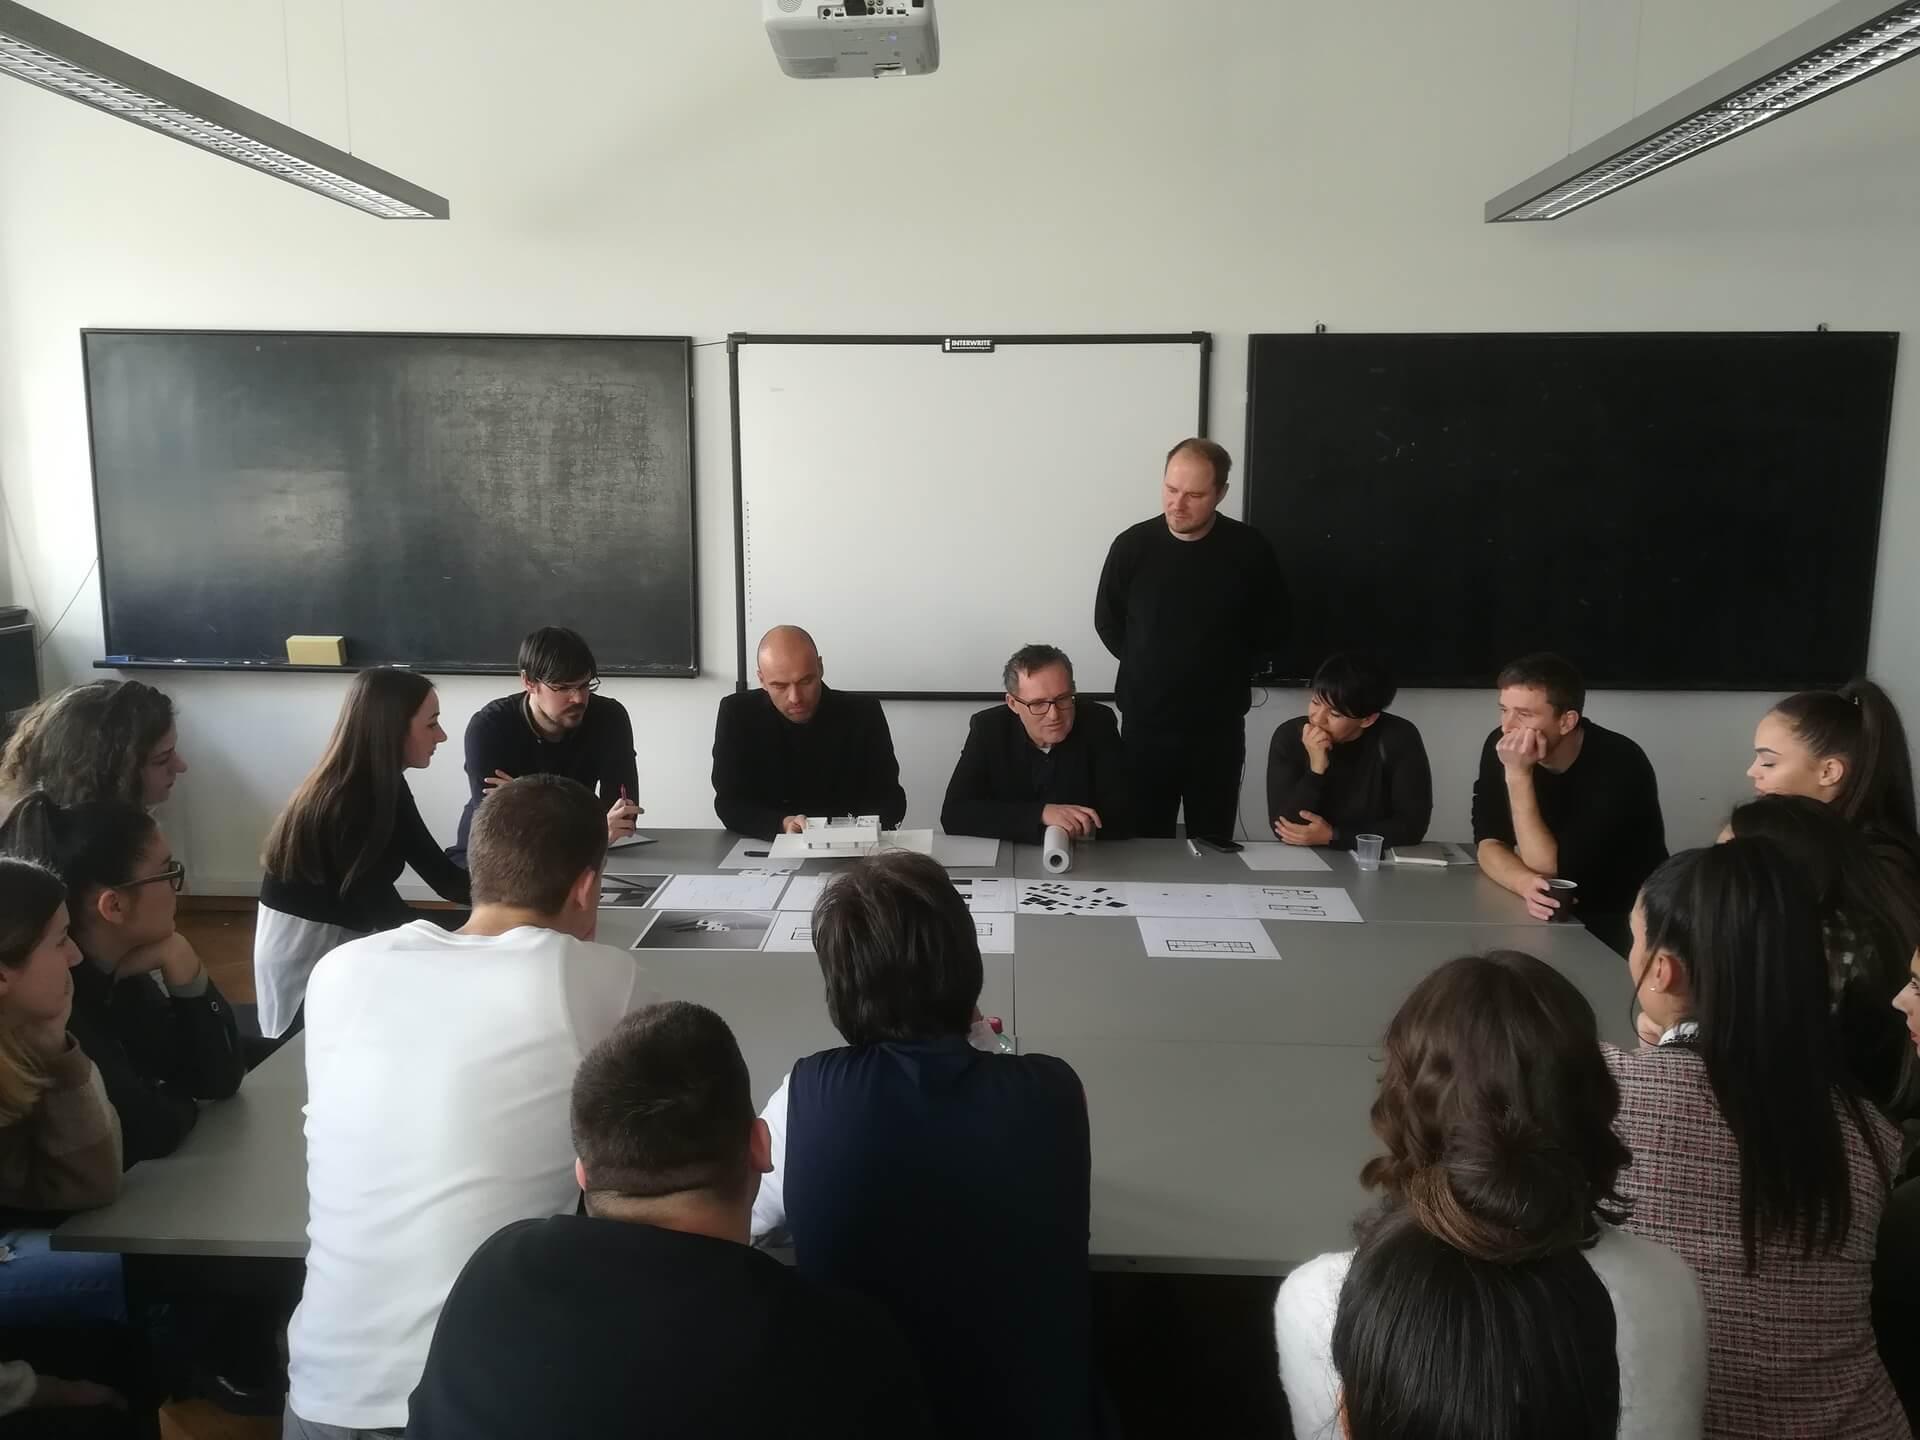 Građevinski Fakultet Sveucilista U Mostaru Faculty Of Civil Engineering University Of Mostar Nastava U Zagrebu Stambene Zgrade I